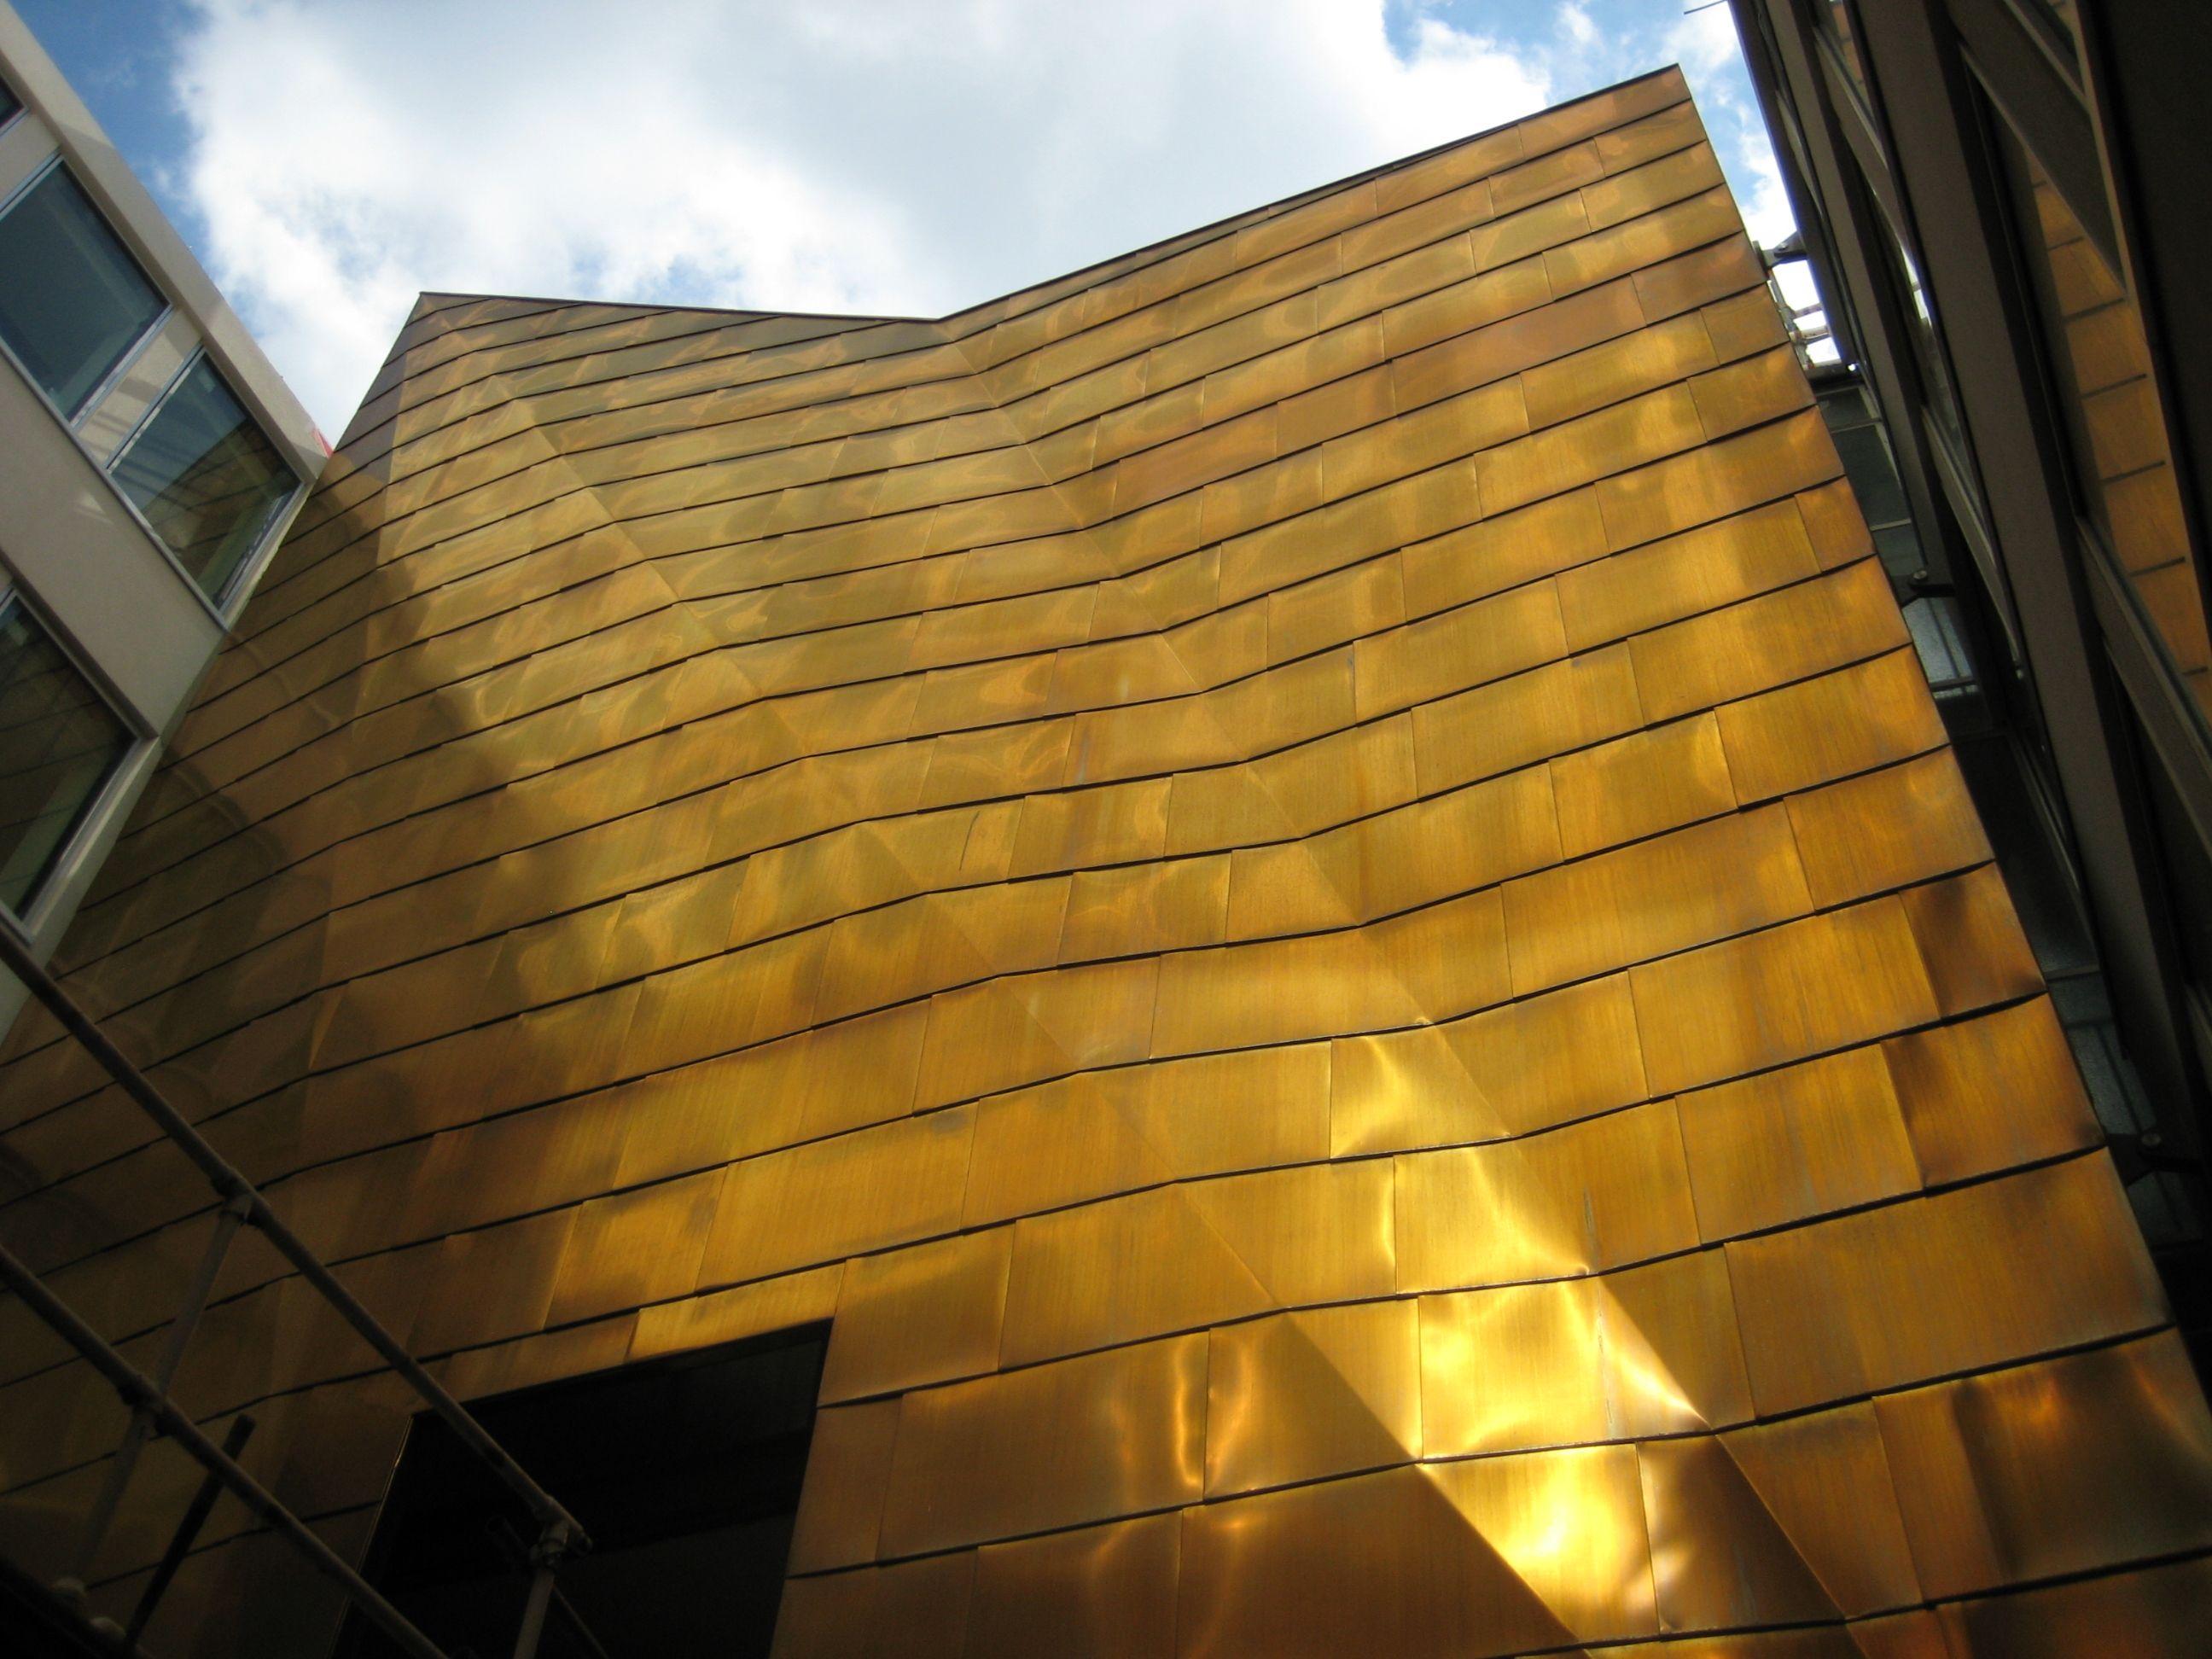 Kme Tecu Brass Holbrook House London Jpg 2 592 215 1 944